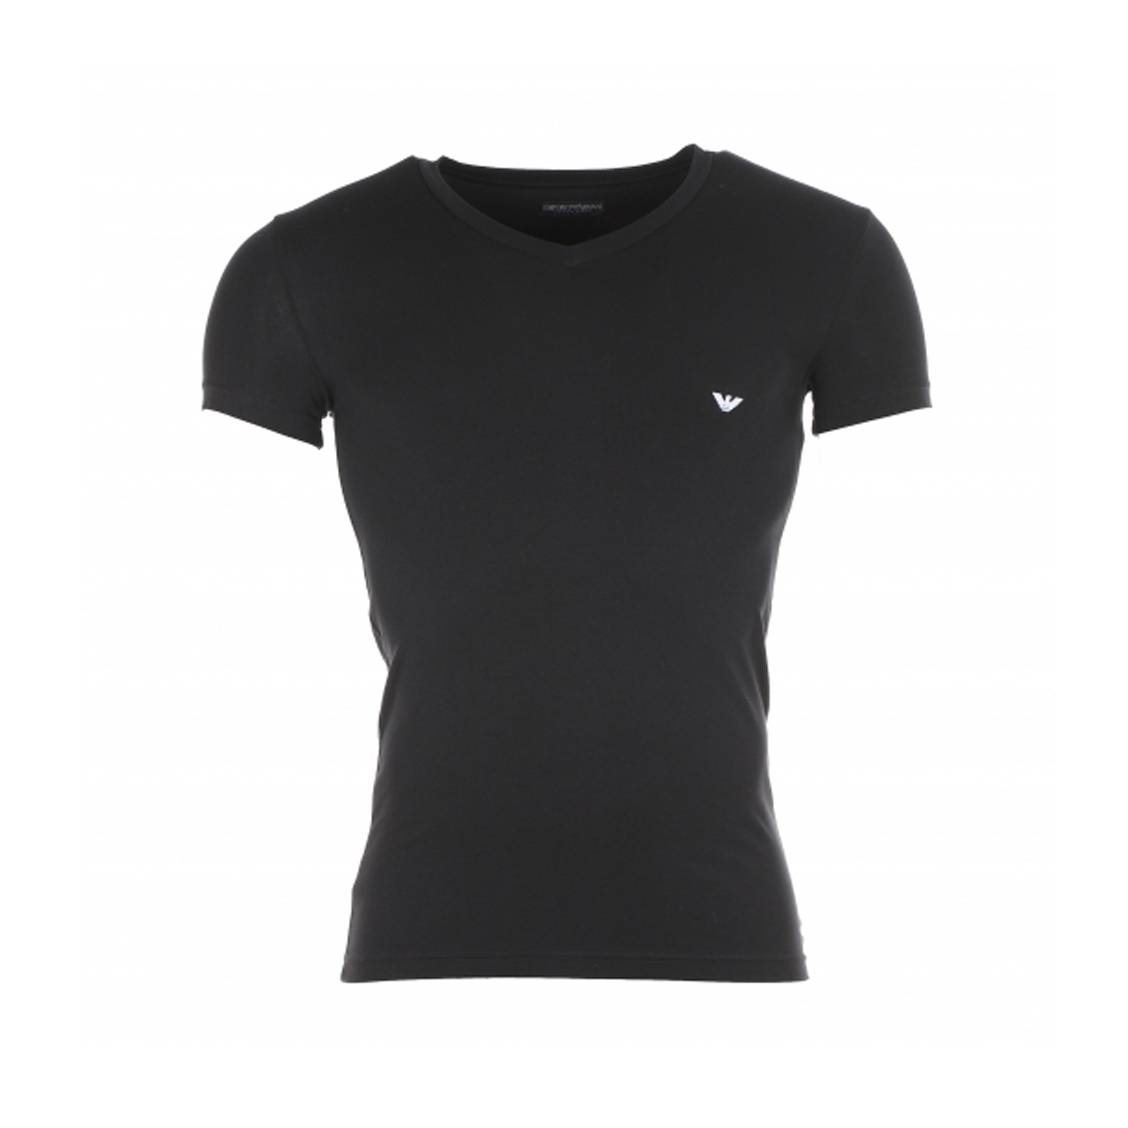 Tee-shirt col v noir  en coton stretch